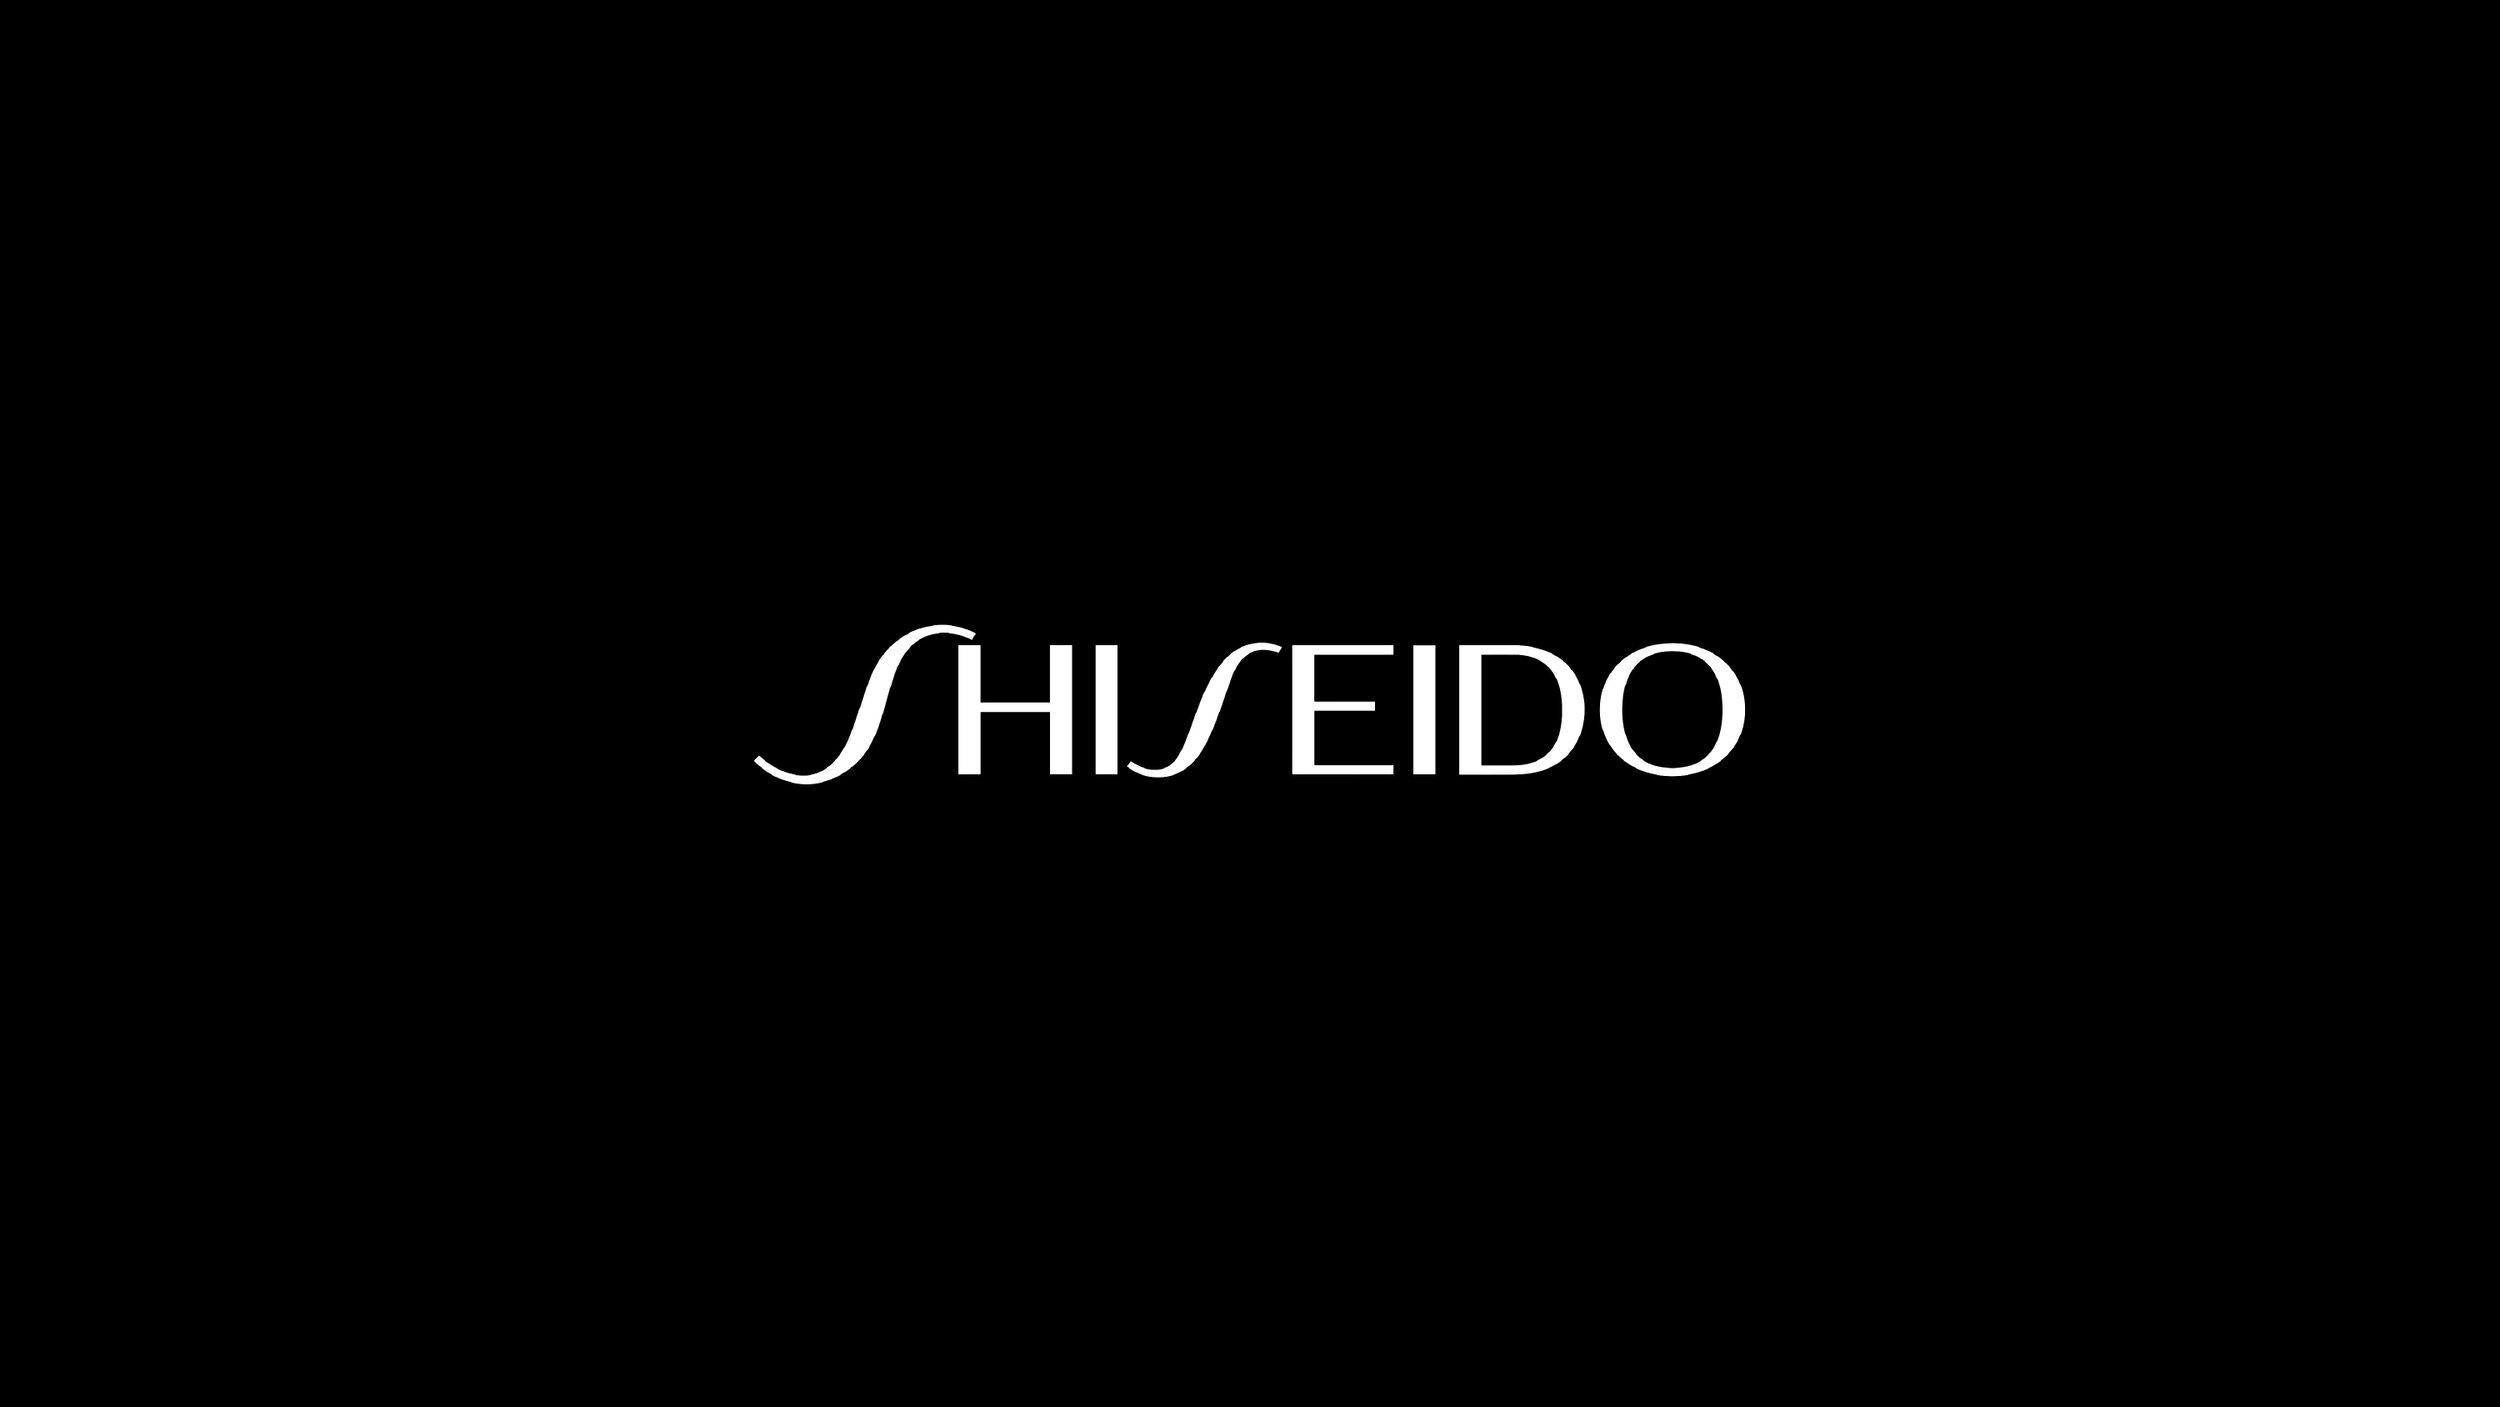 shiseido_brandbook_opening.jpg